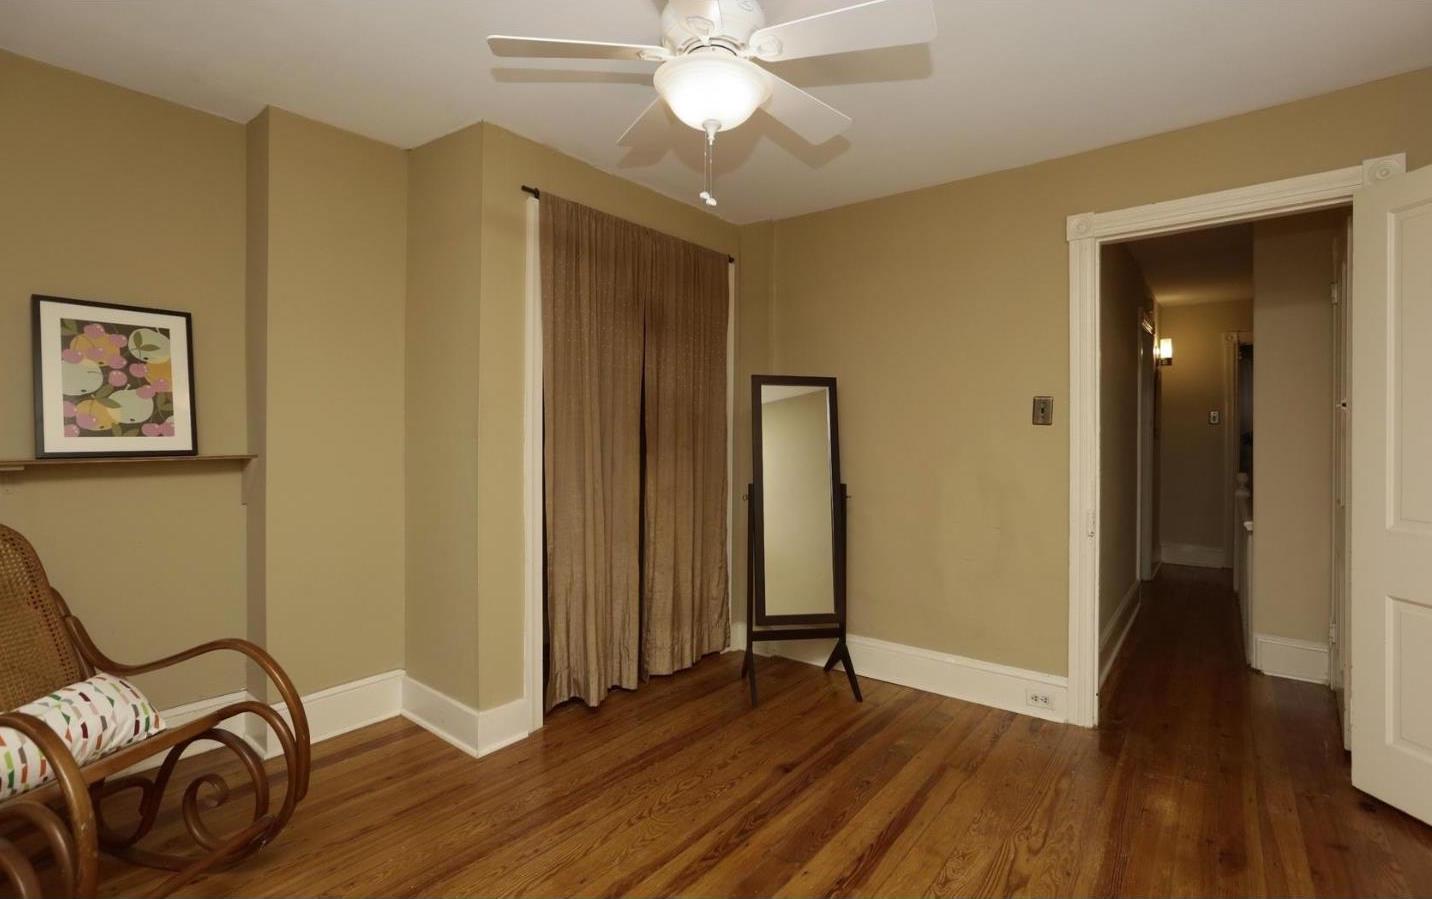 lawnton bedroom 2.jpeg